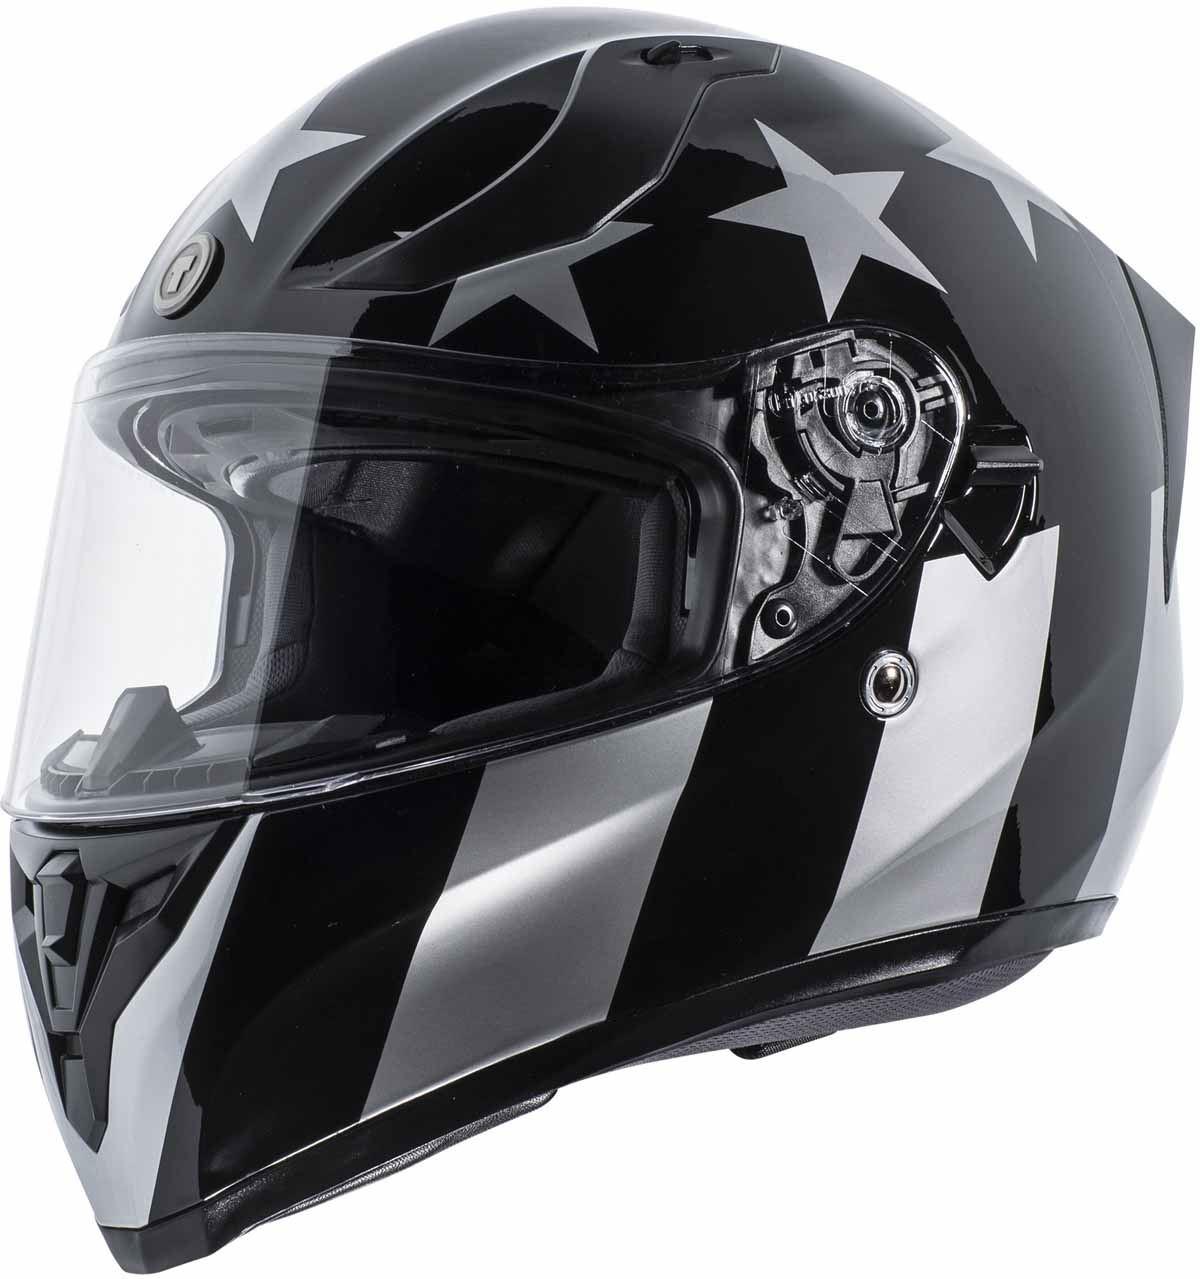 miniature 8 - Torc T15 T15B Helmet Bluetooth Blinc or without - Inner Sun Shield DOT XS-2XL